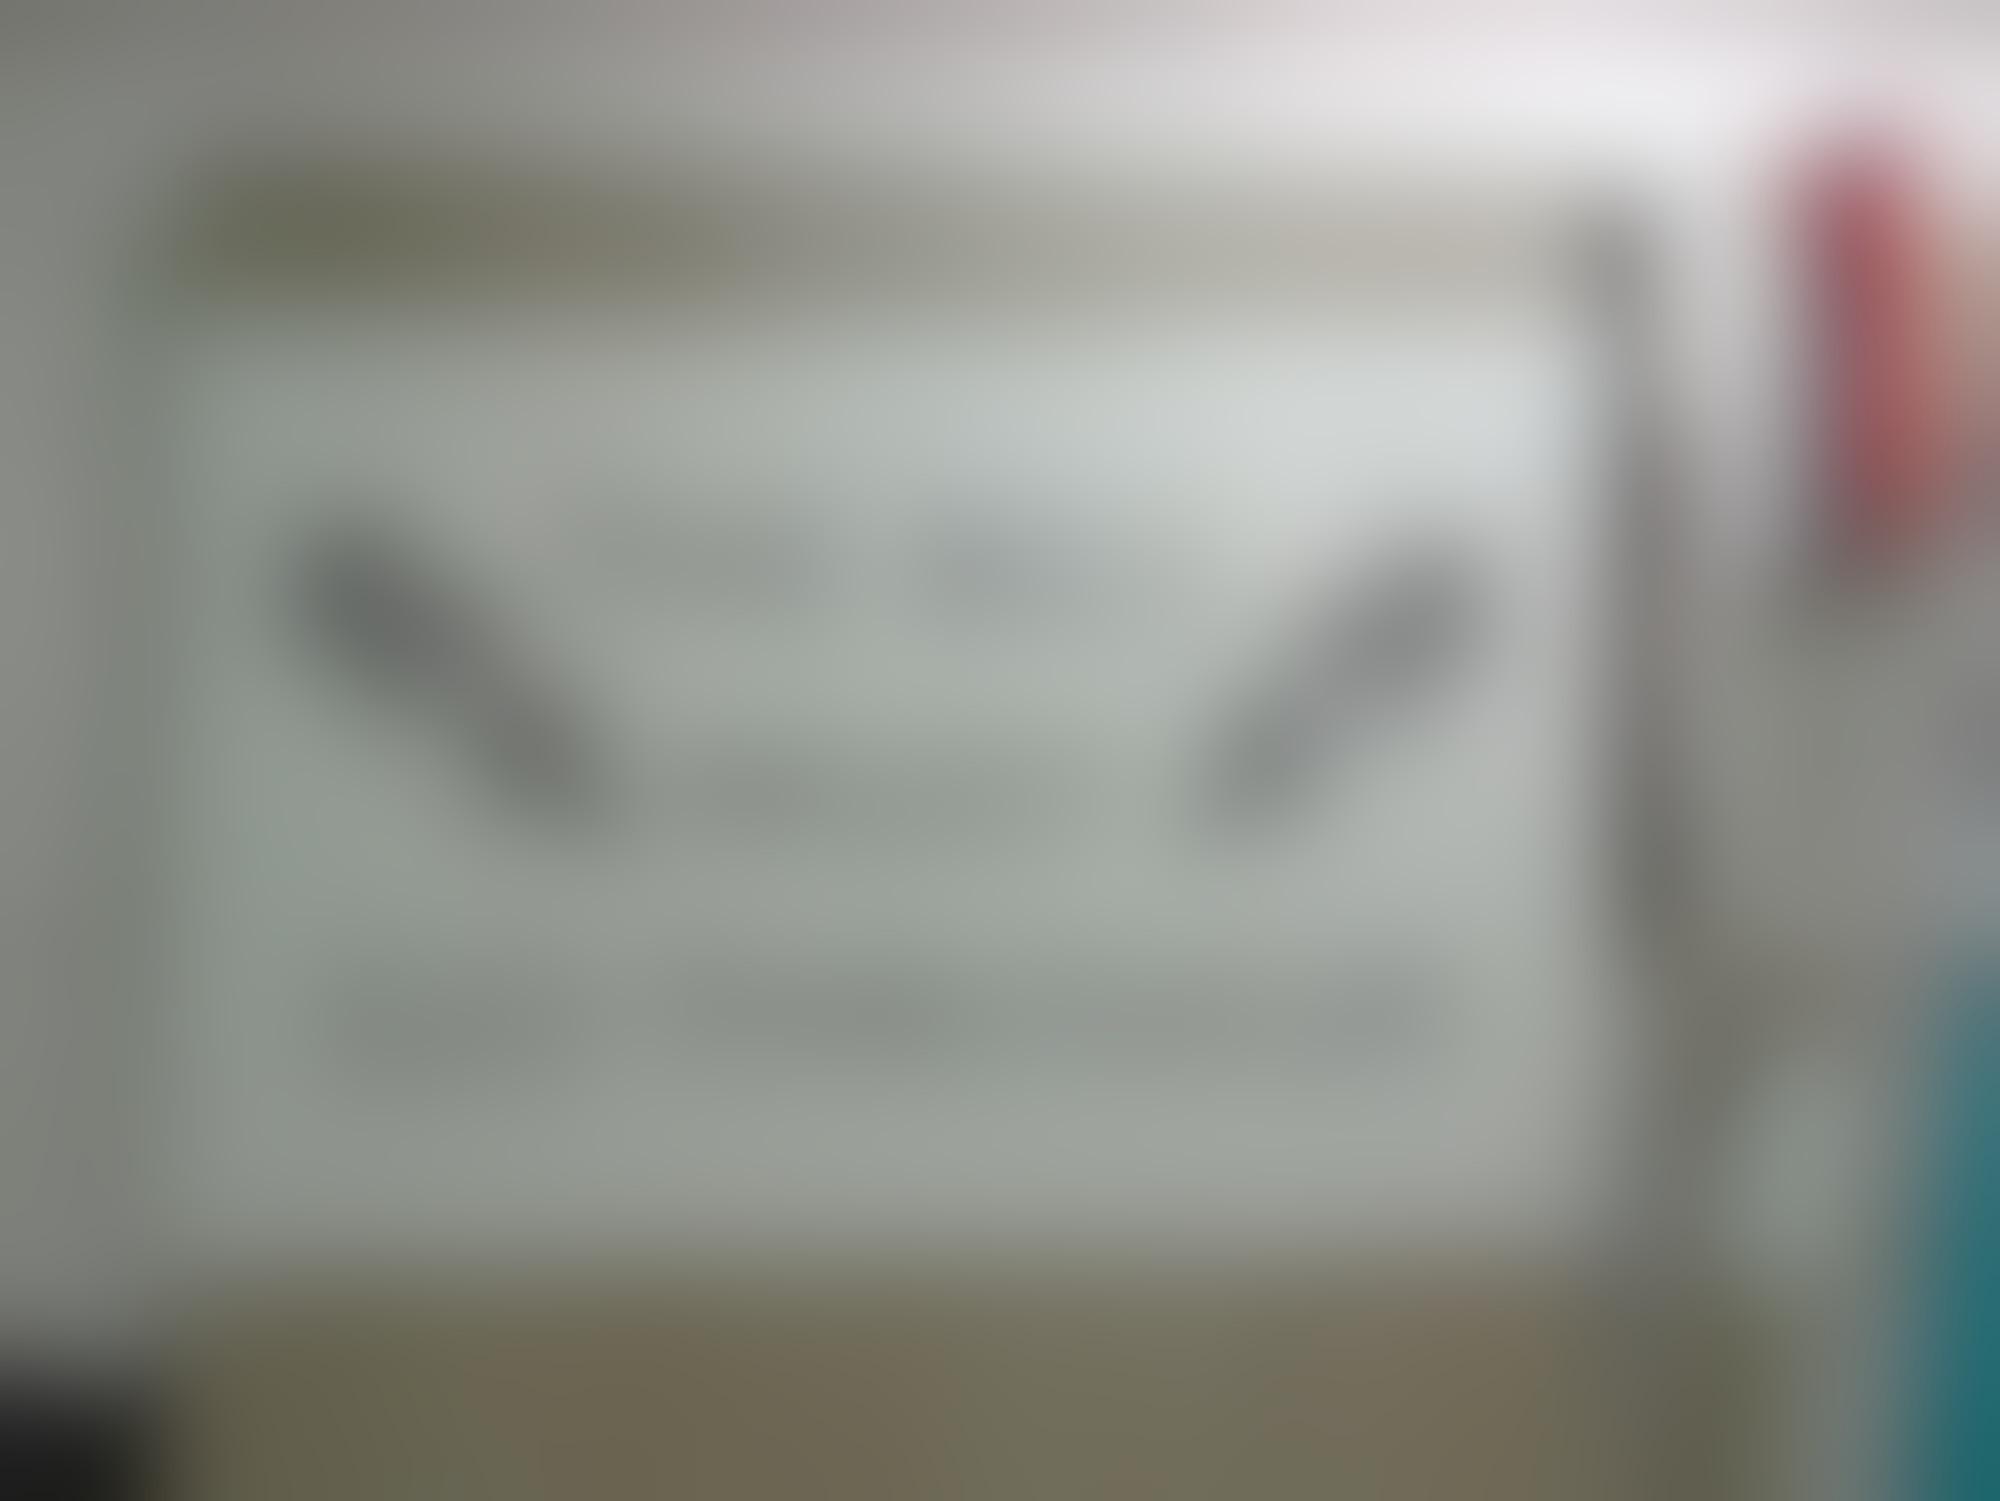 20140304 122935 resized orig autocompressfitresizeixlibphp 1 1 0max h2000max w3 D2000q80s2652f8ac9a1fe5df80576f85acfcc0e2